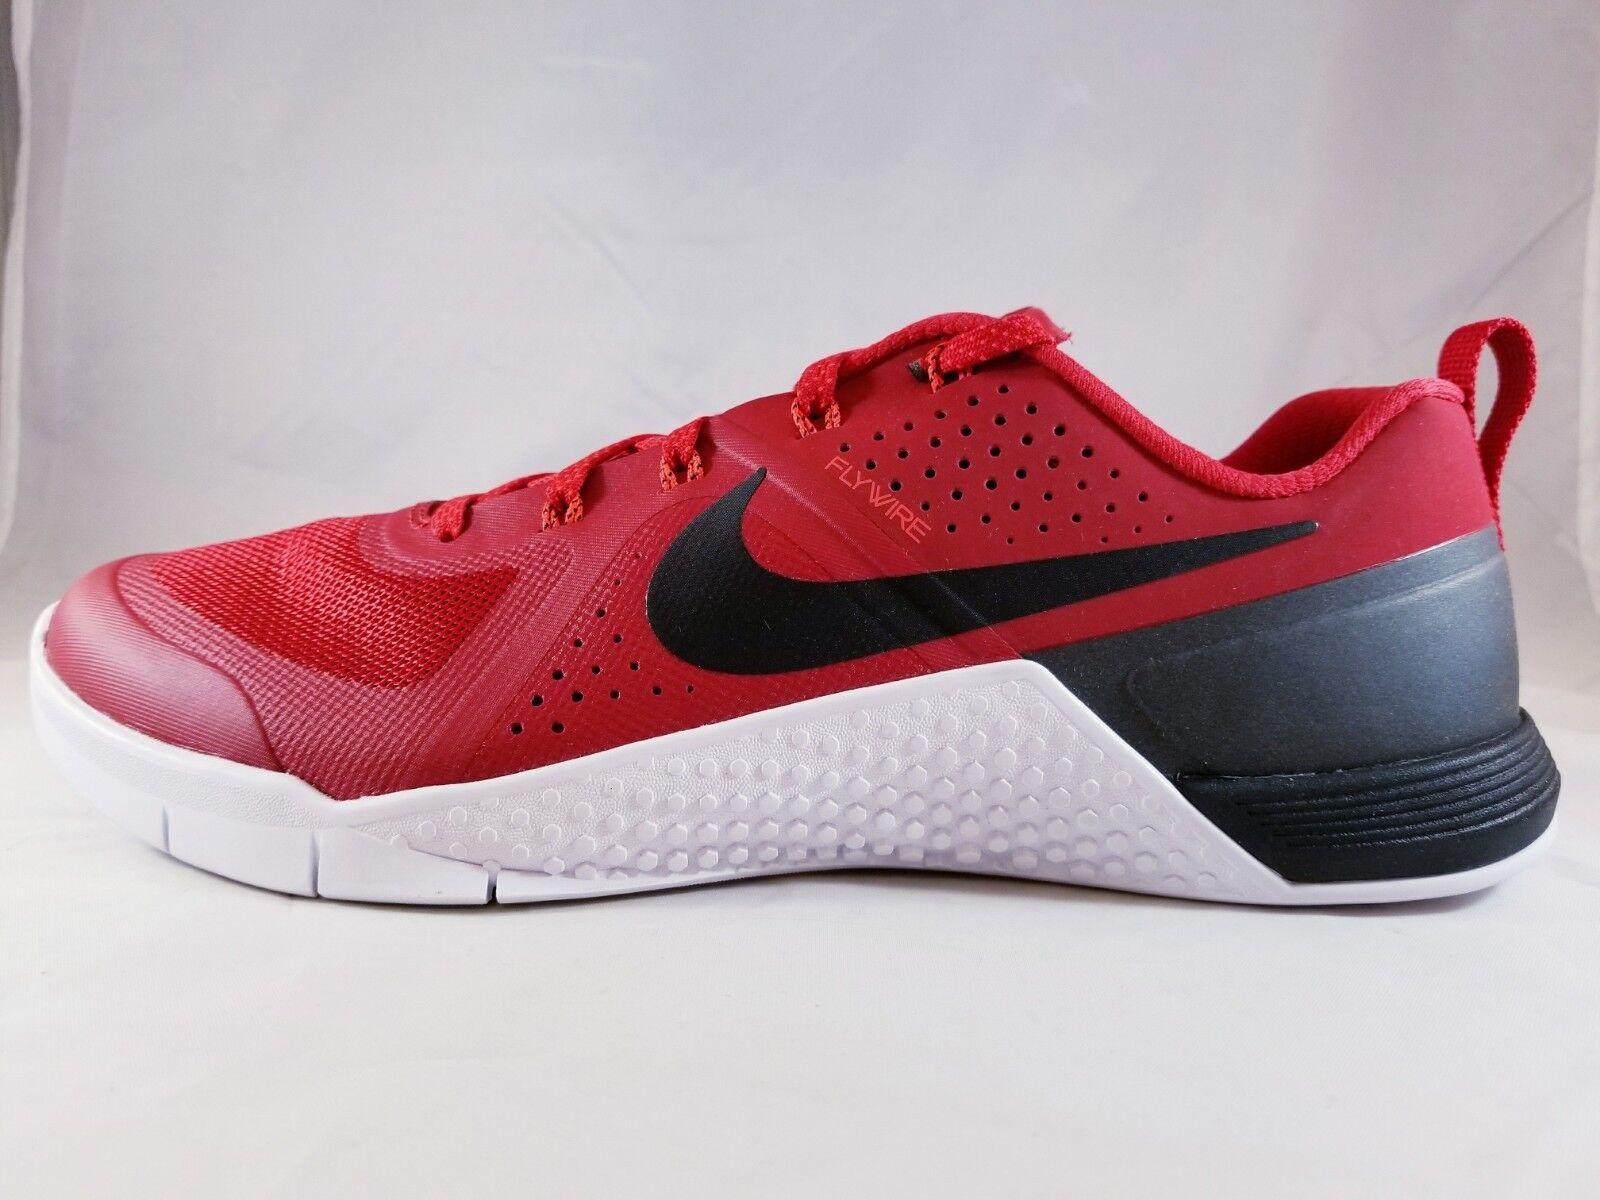 Nike Metcon 1 Men's Cross Training Shoe 704688 616 Size 15